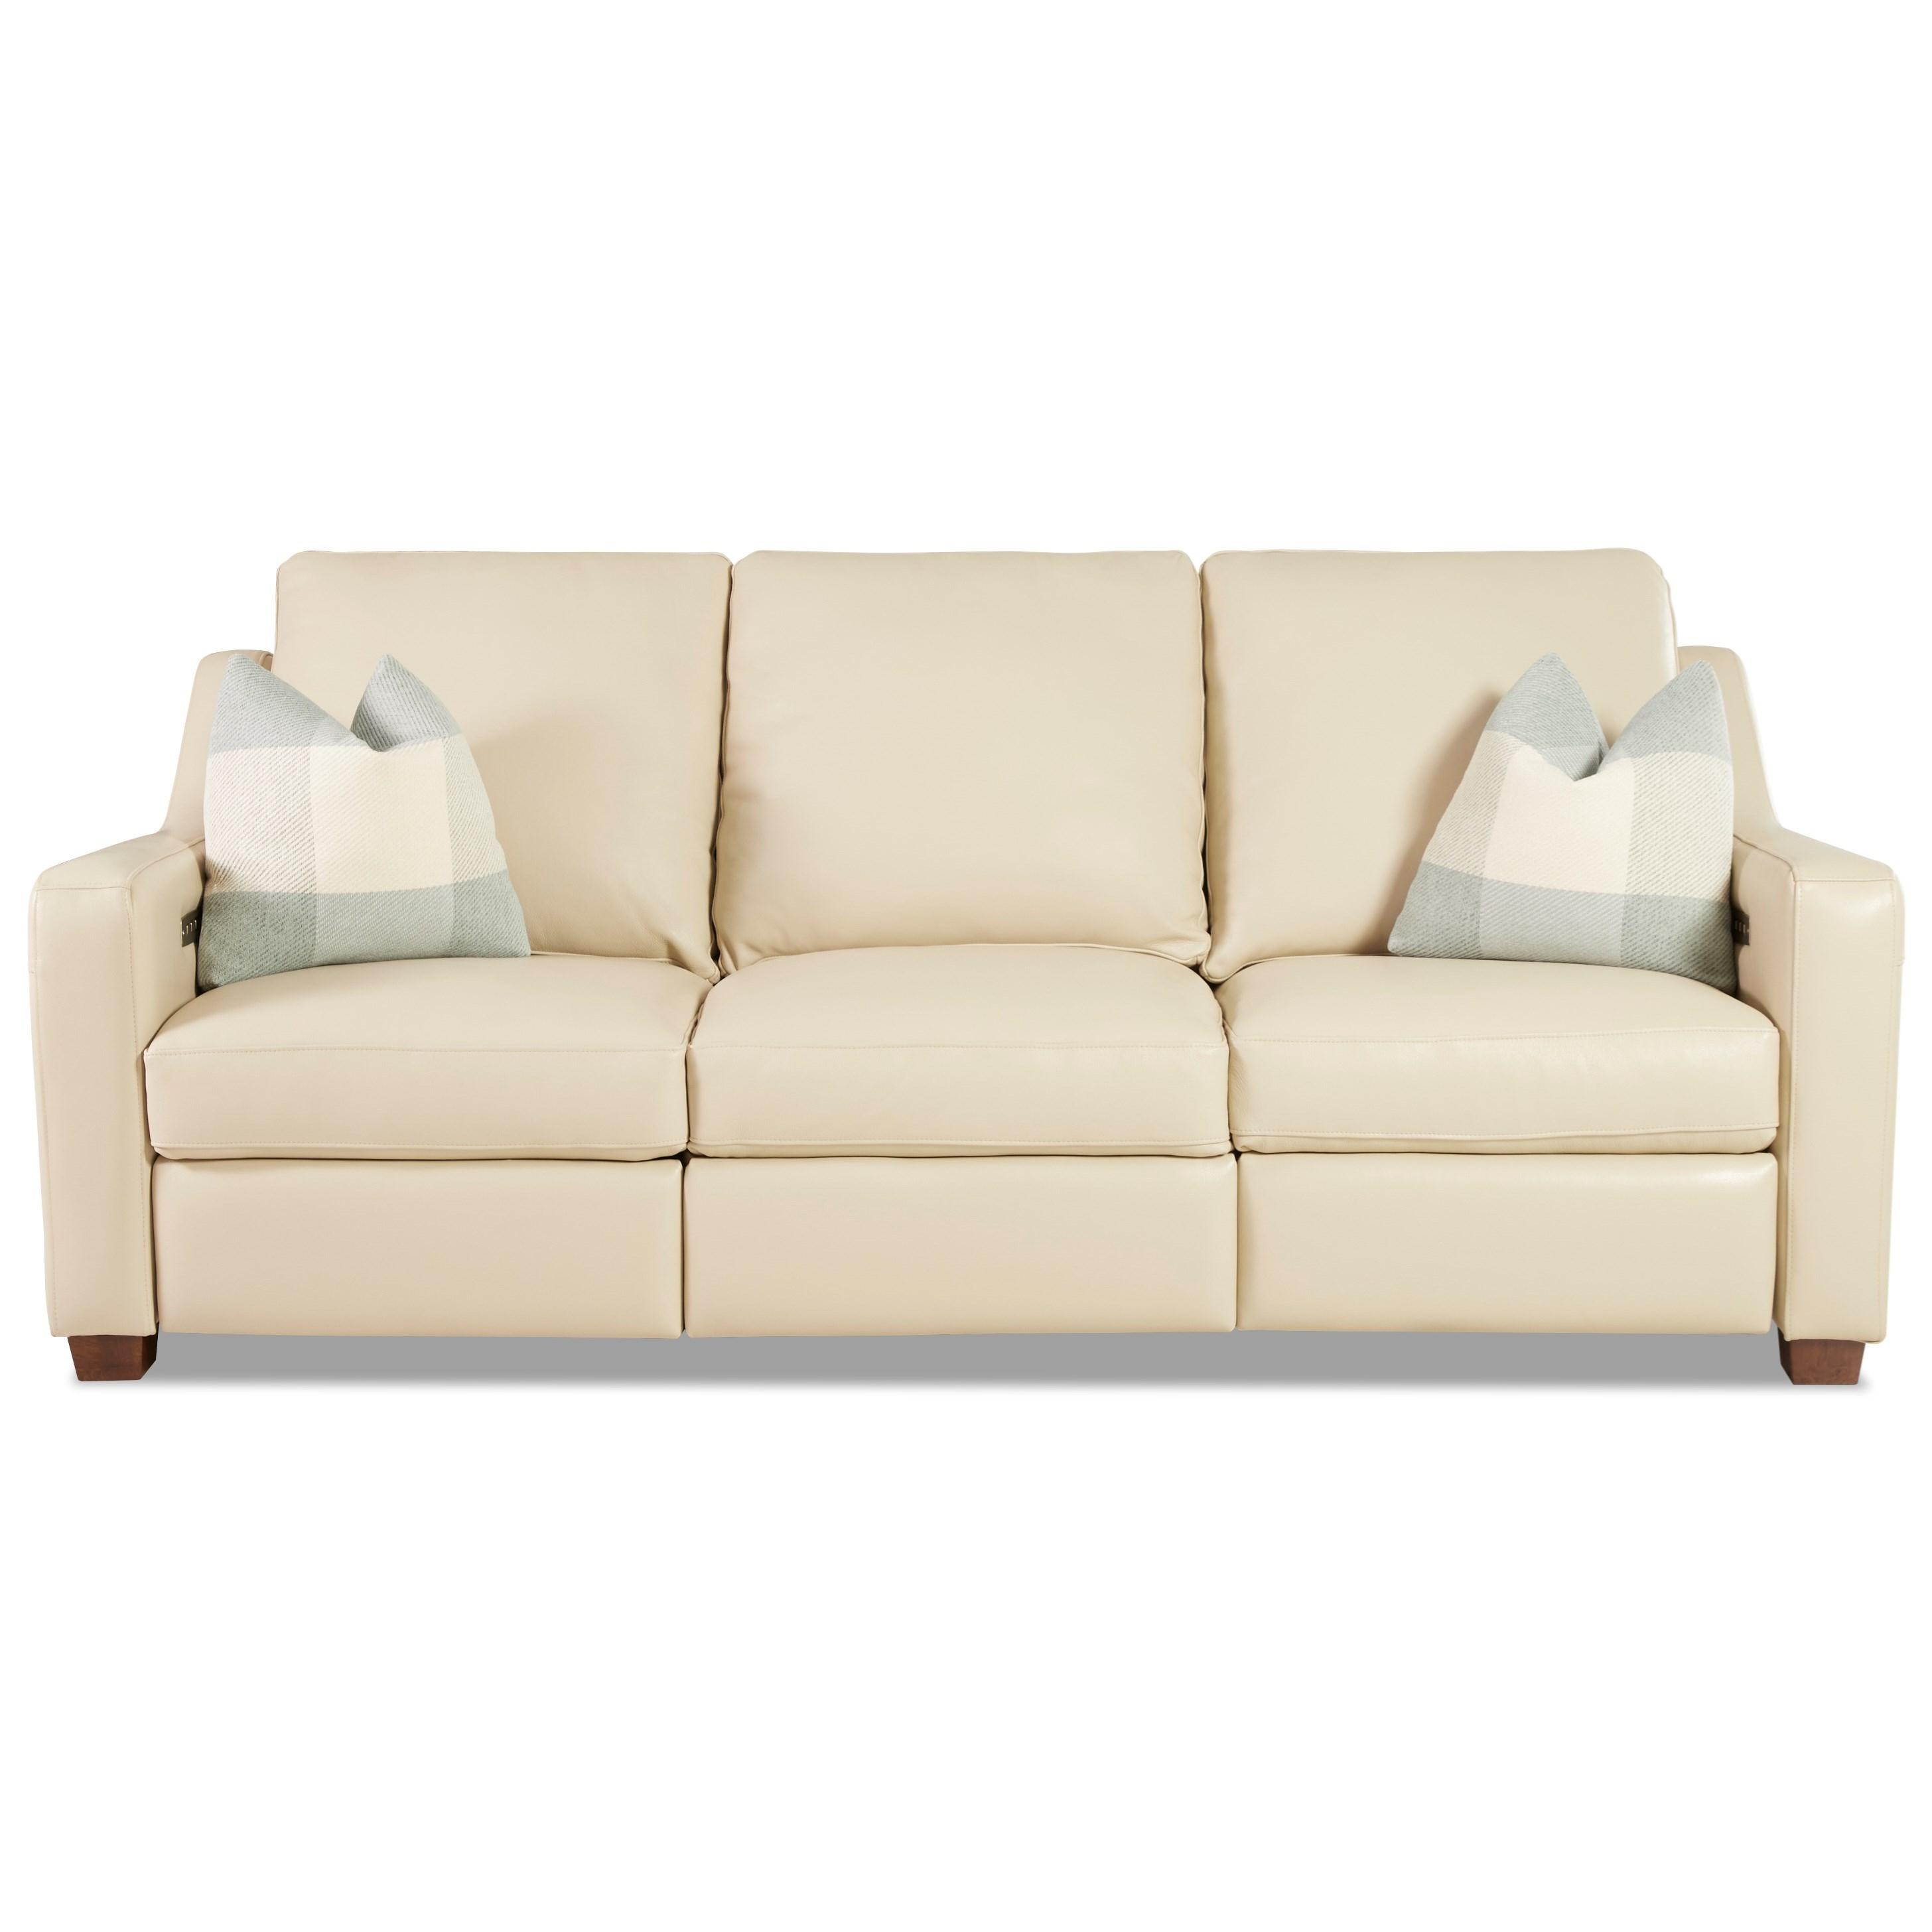 Power Hybrid Sofa with Power Headrest